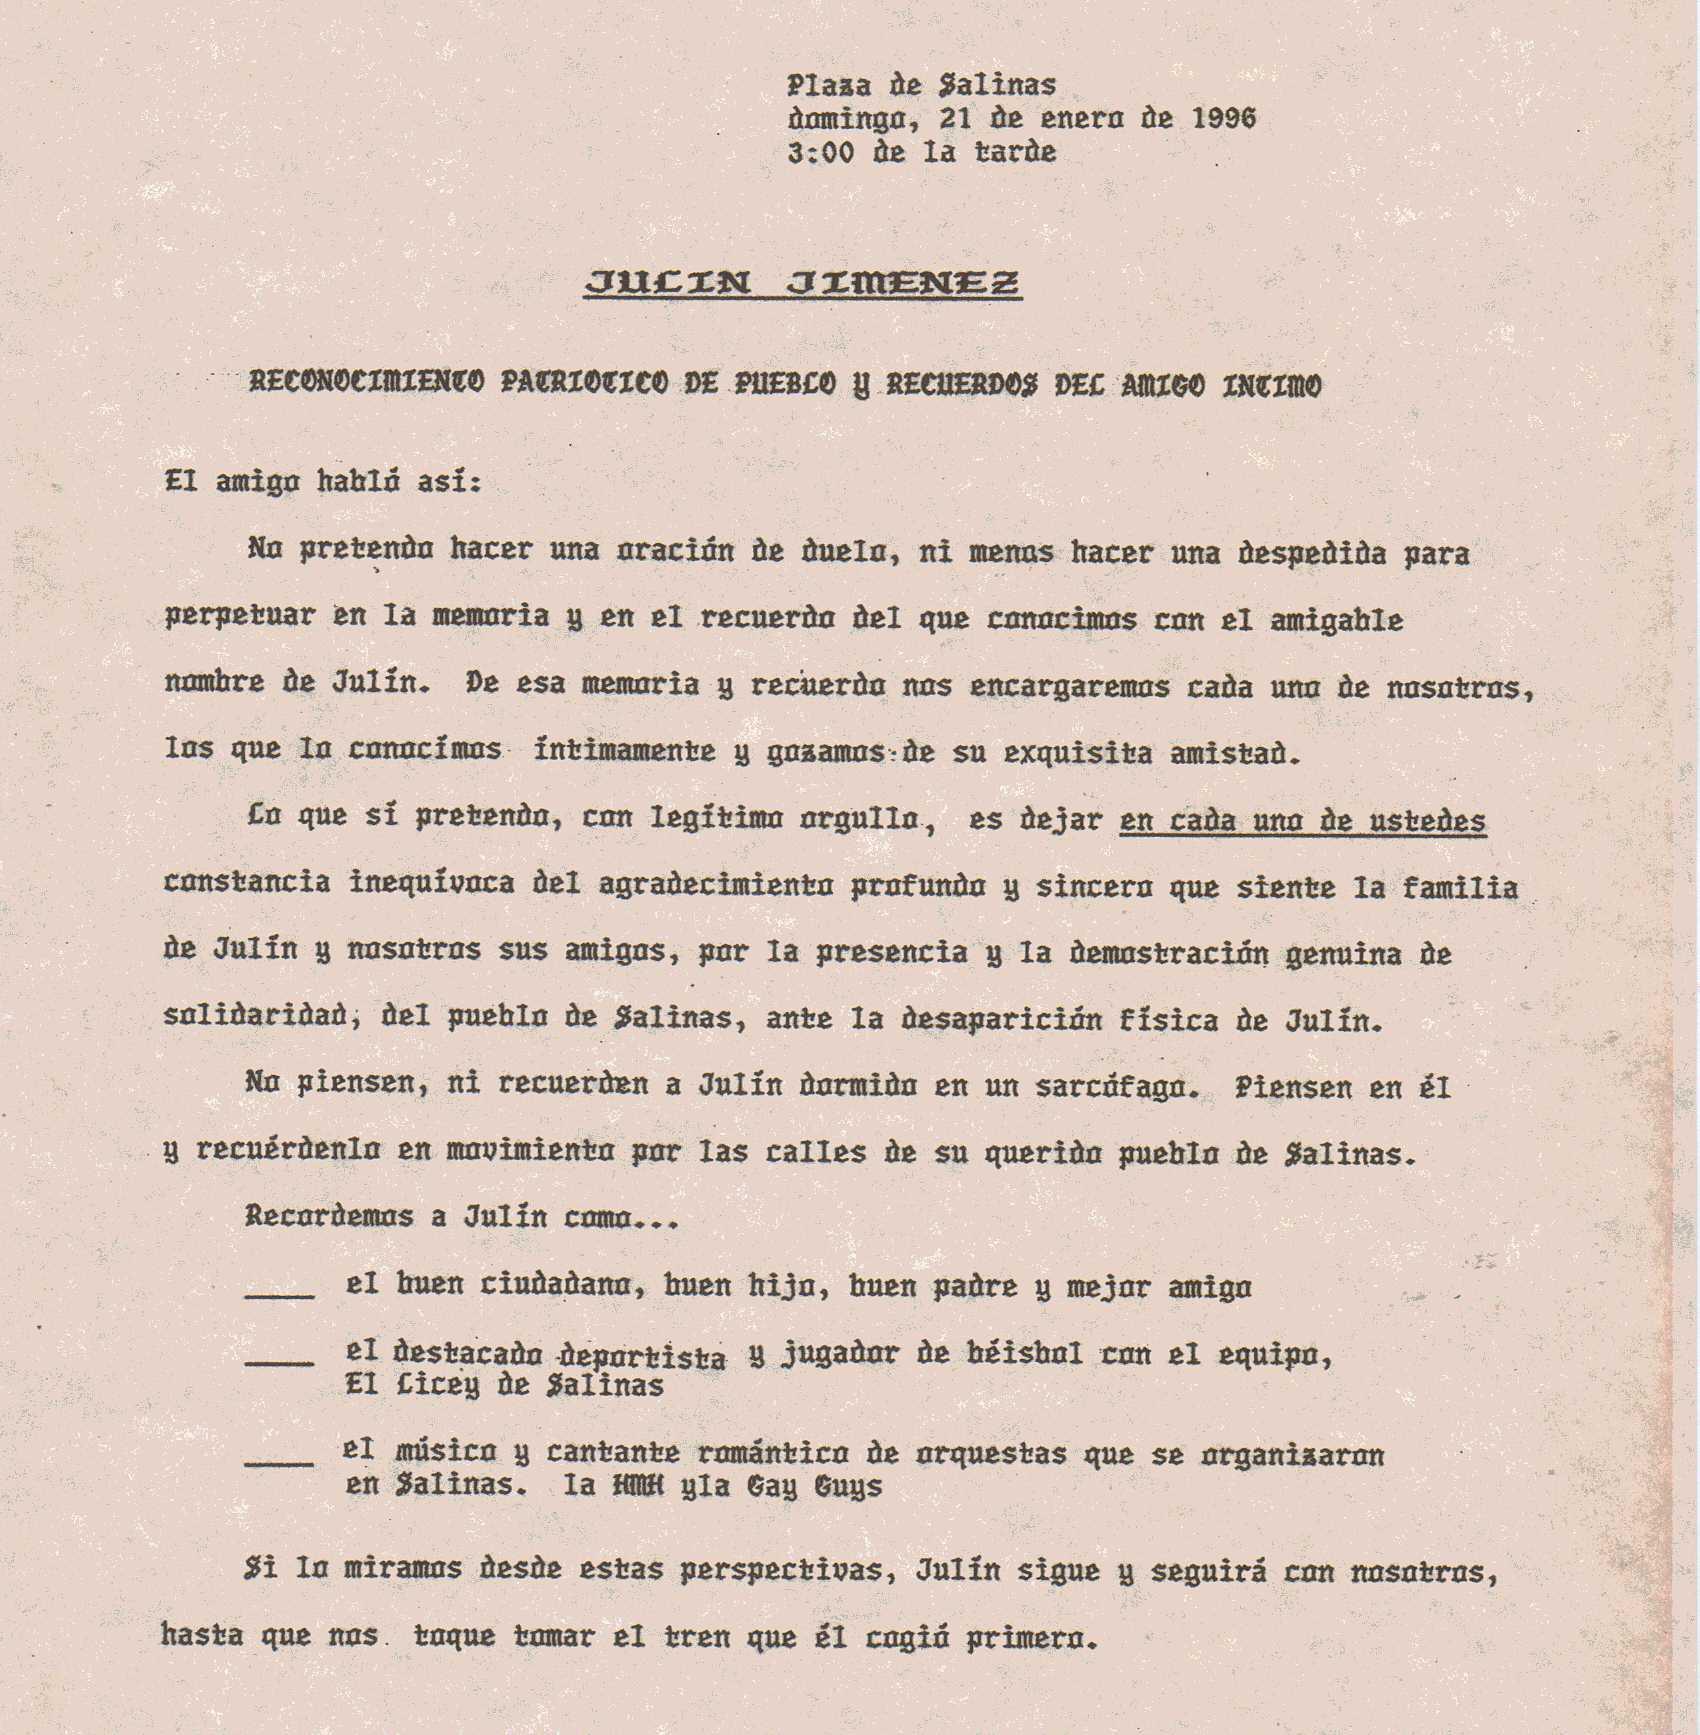 Documentos: Palabras de despedidas a Julín Jimenez / Clemente Llovet ...